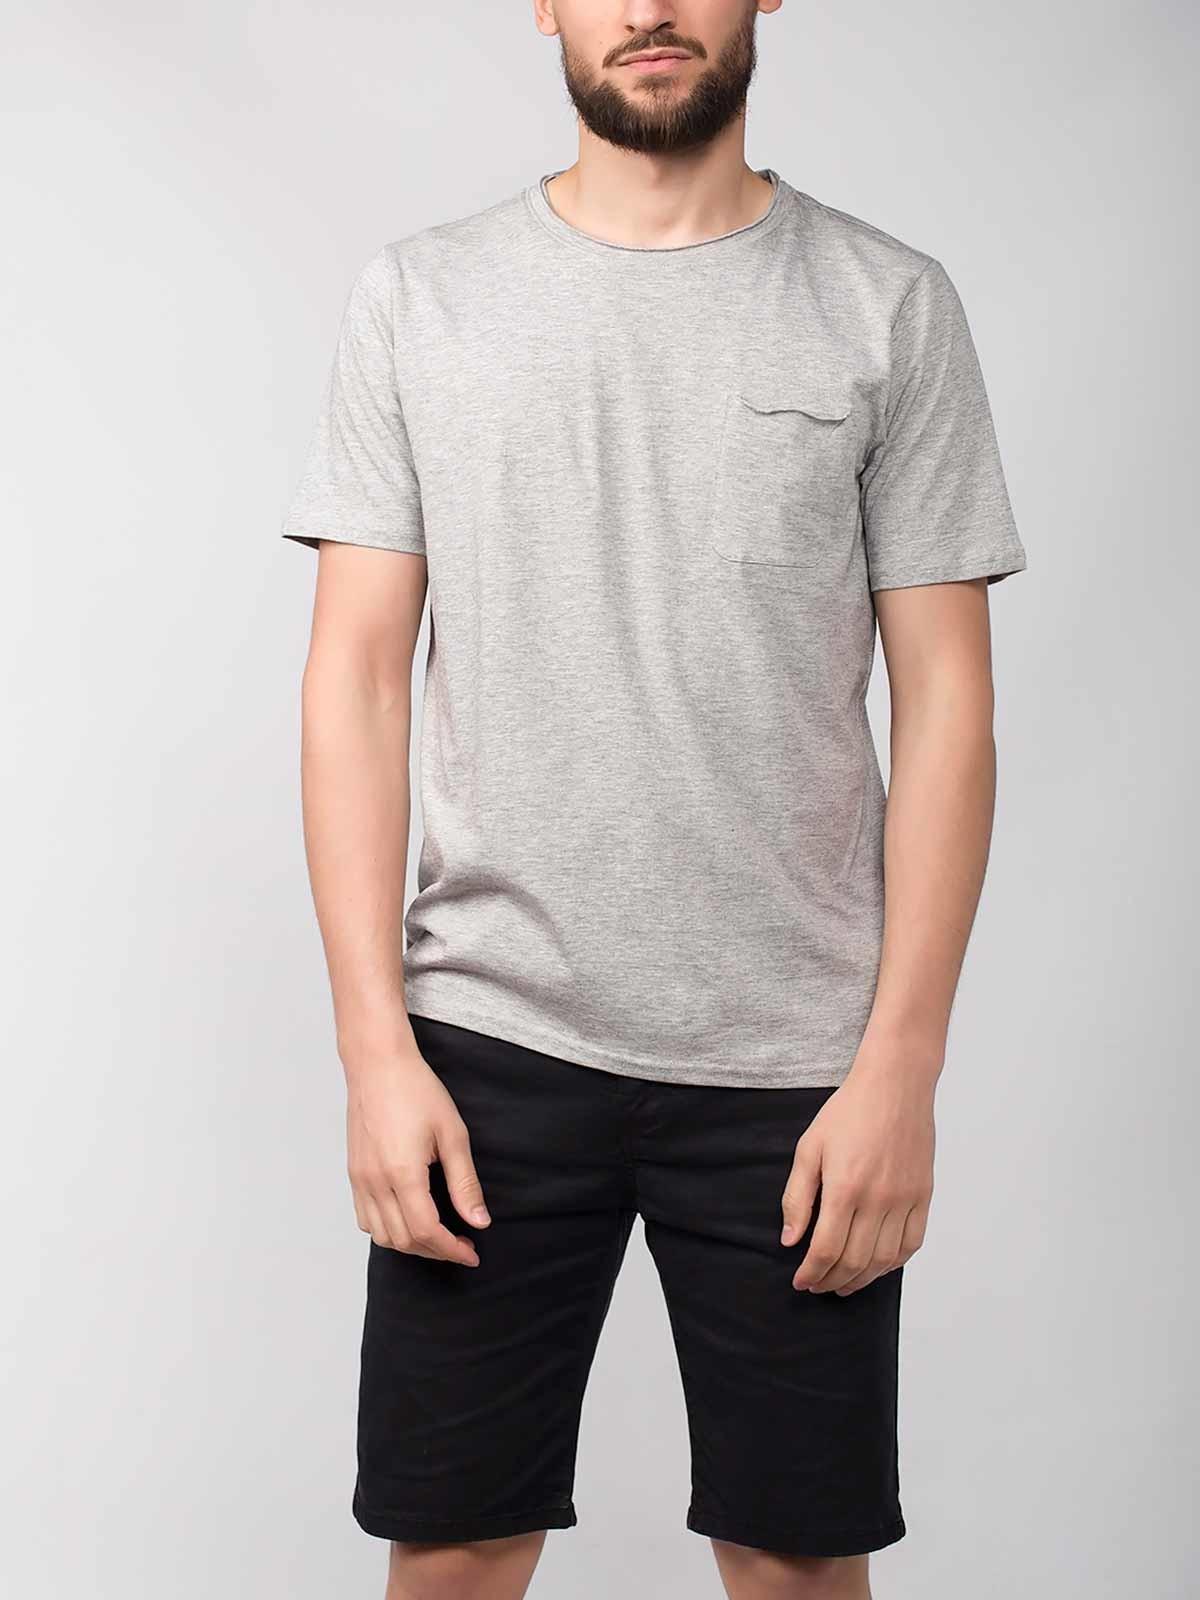 T-shirt manga curta com bolso